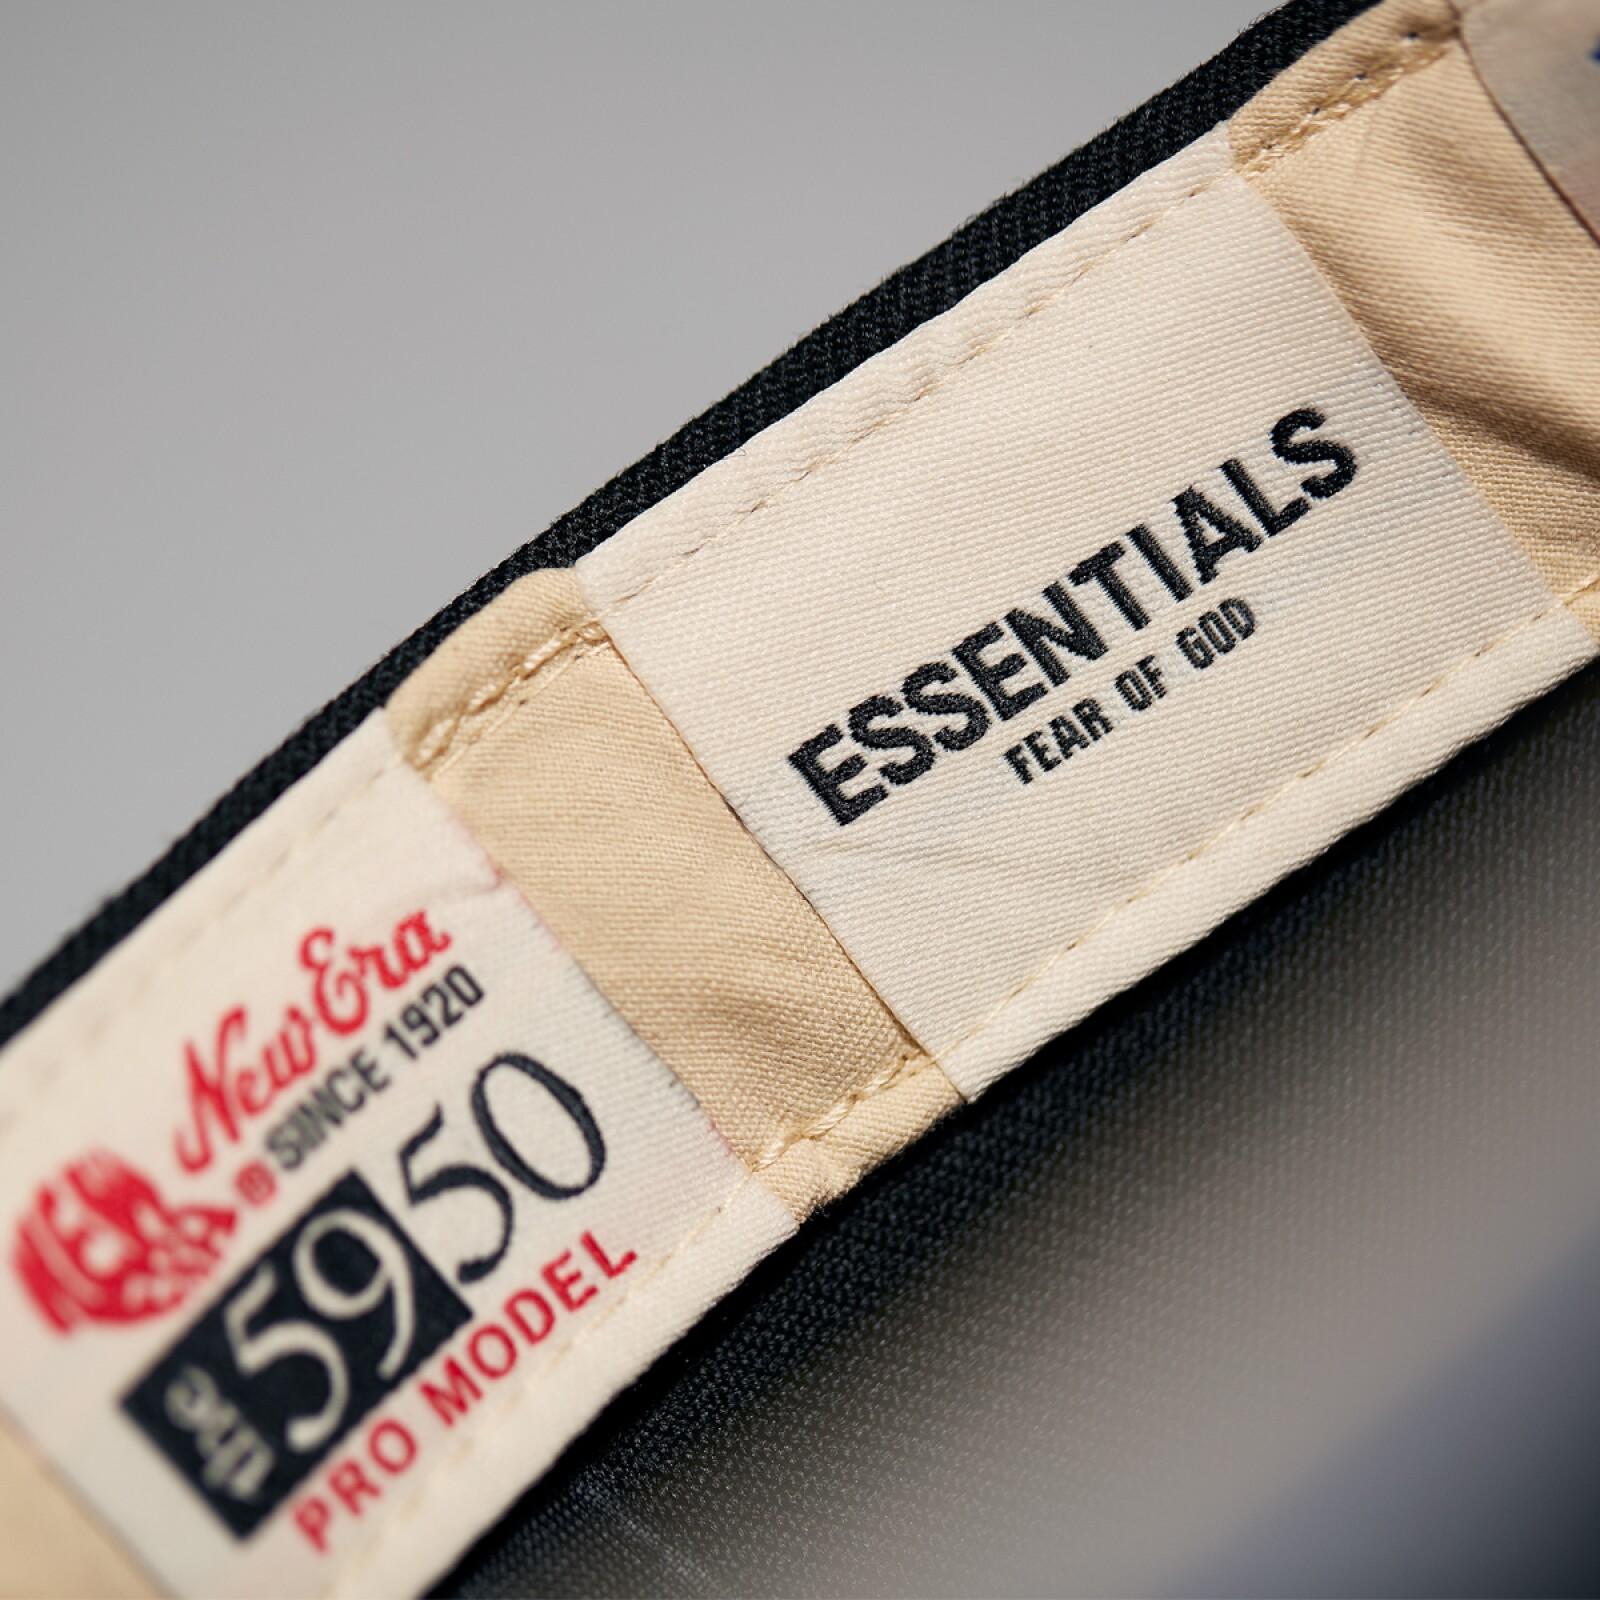 LIFE19_FoG_Essentials_Launch_Facebook_1200x1200_0008_DETAIL2.jpg